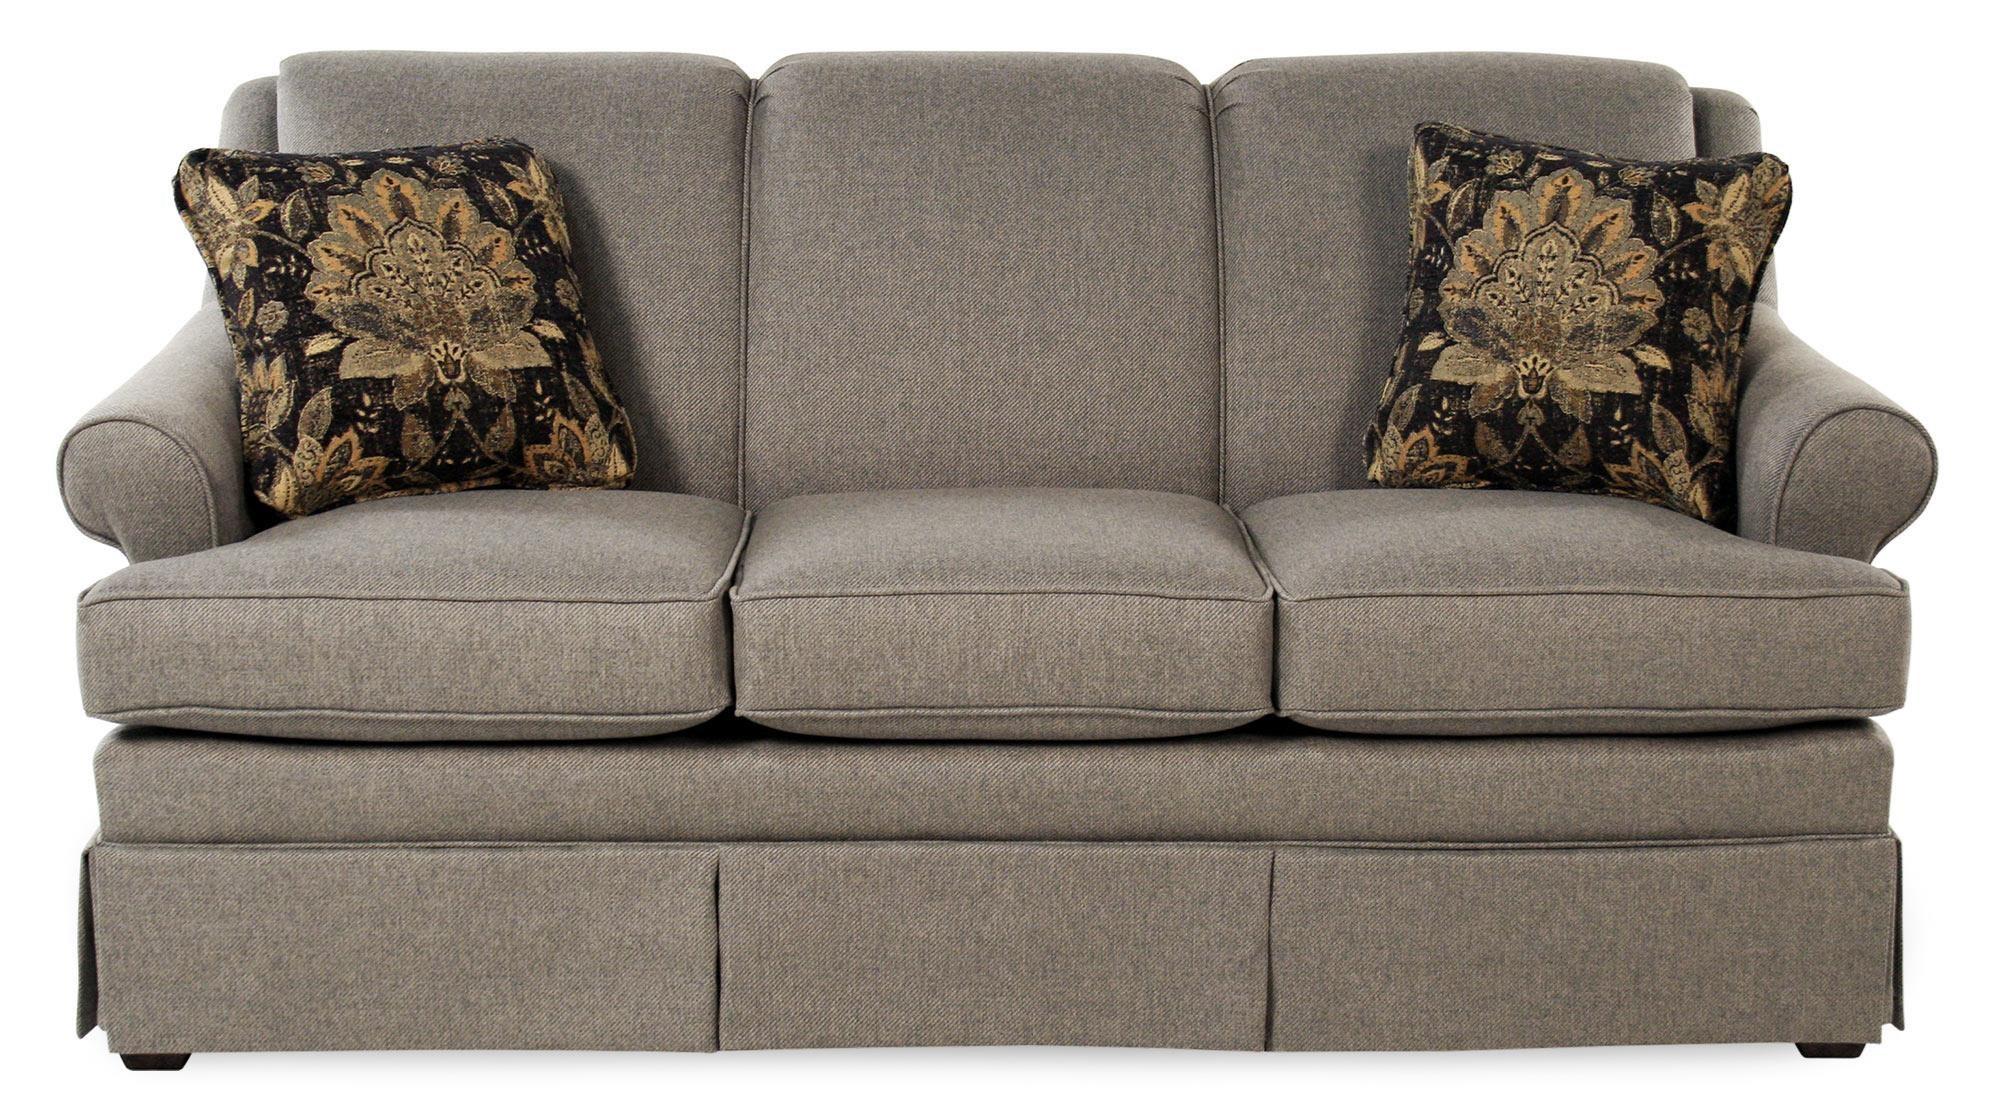 Cozy Life Audrey Roll Arm Sofa   Item Number: 920550 CONTENT22